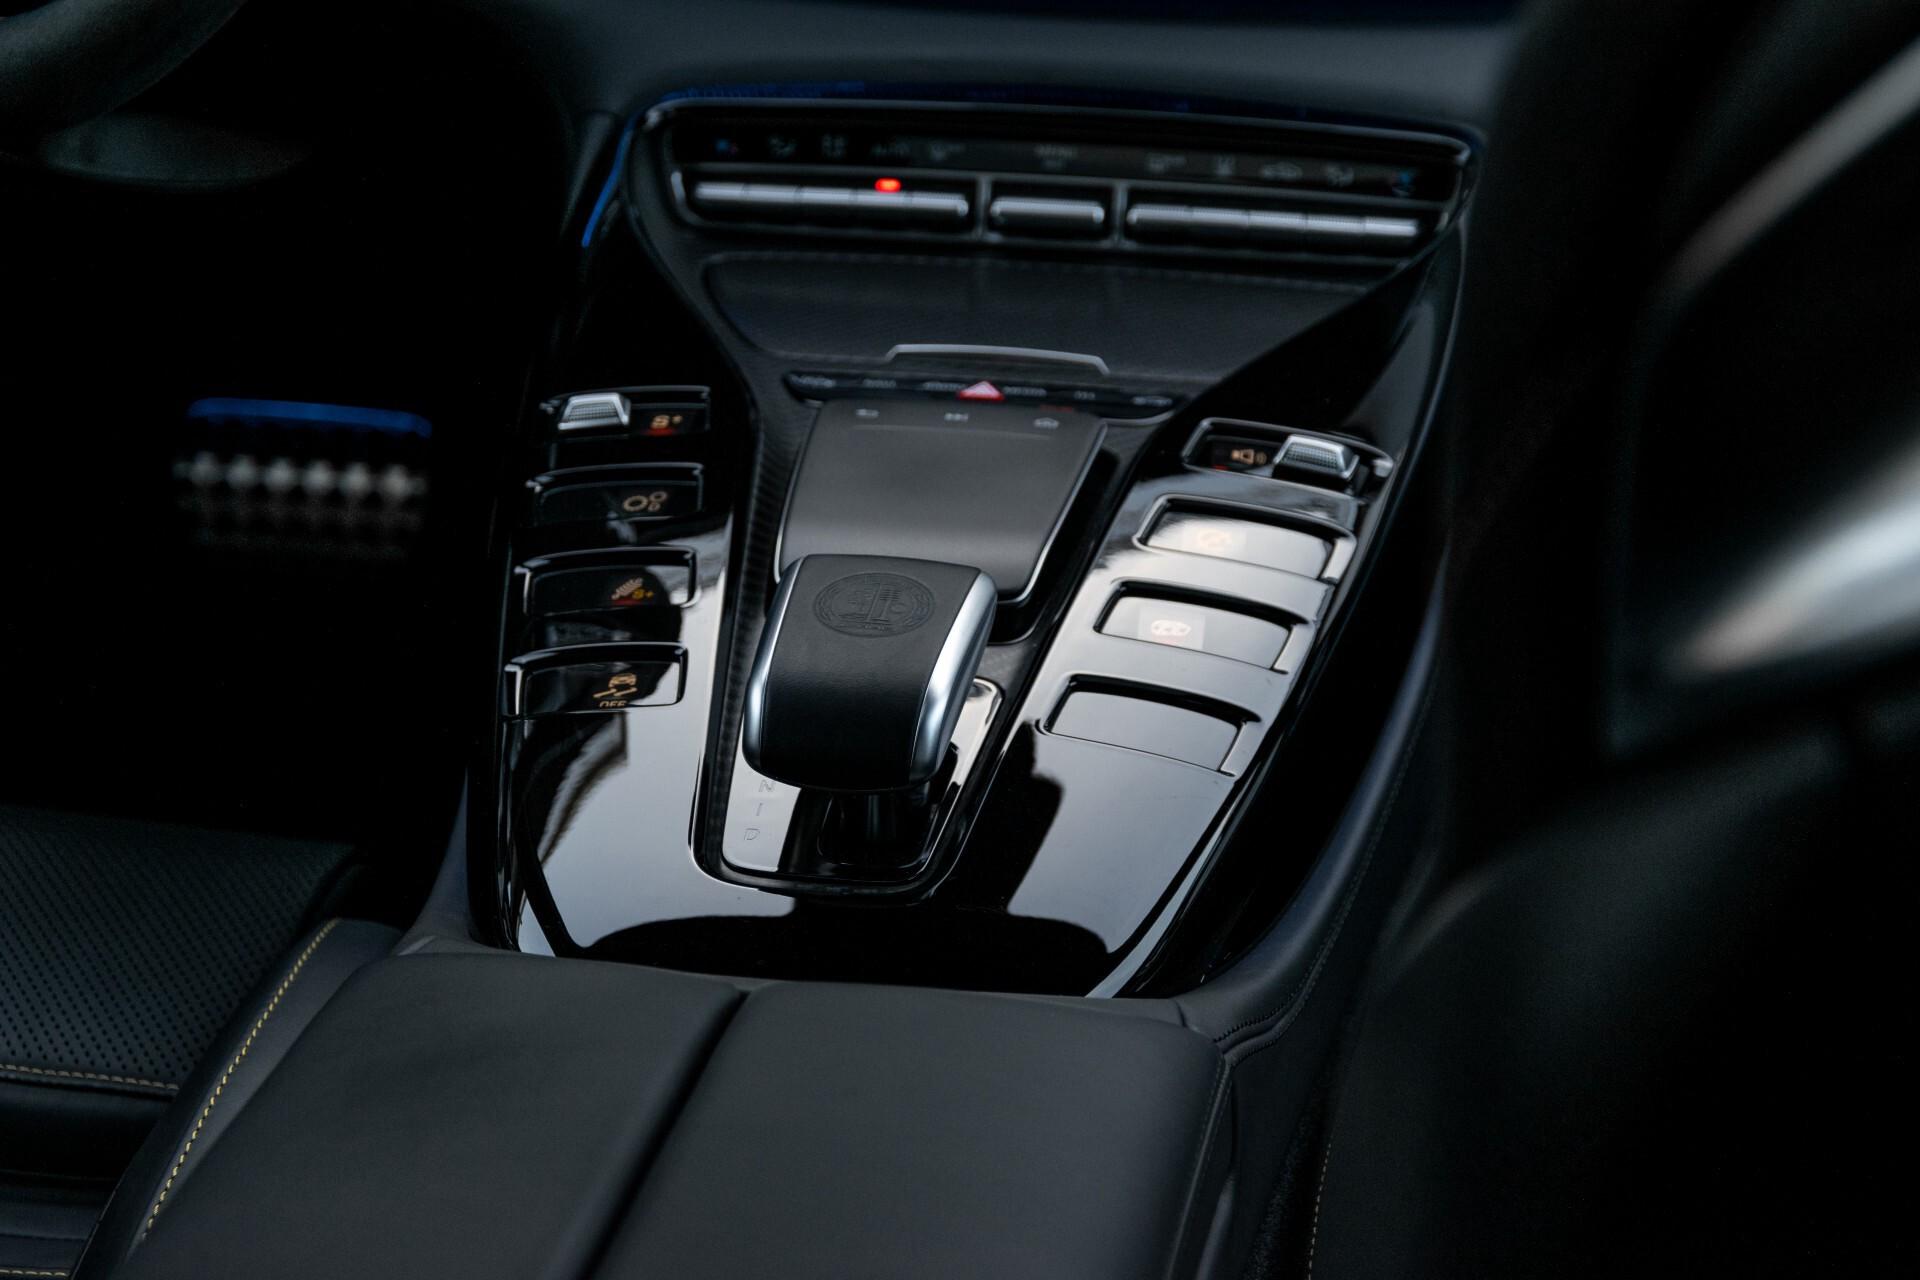 Mercedes-Benz AMG GT 4-Door Coupe 63 S 4MATIC+ Edition 1 Keramisch/Carbon/First Class/Dynamic Plus/Burmester High End 3D Aut9 Foto 70